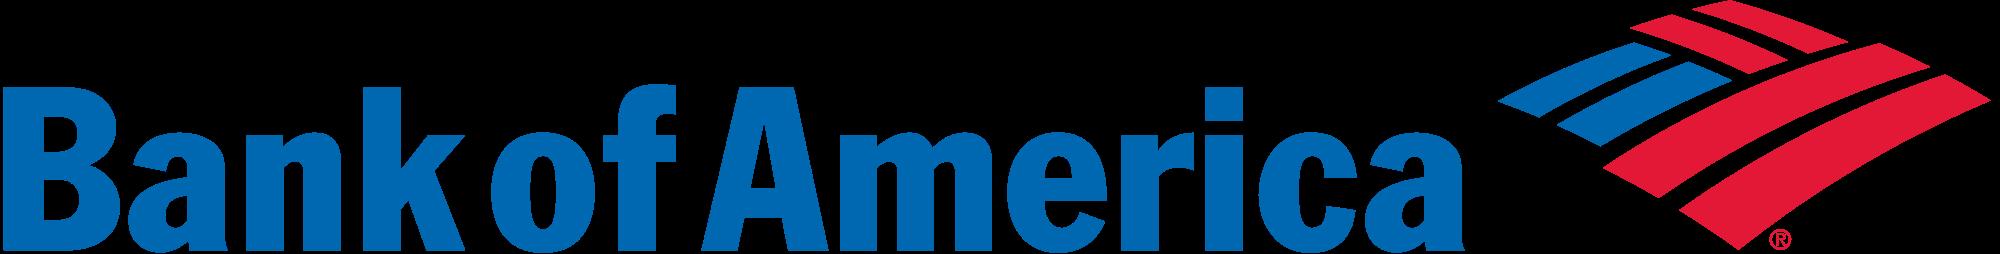 File logo svg wikimedia. Bank of america clipart